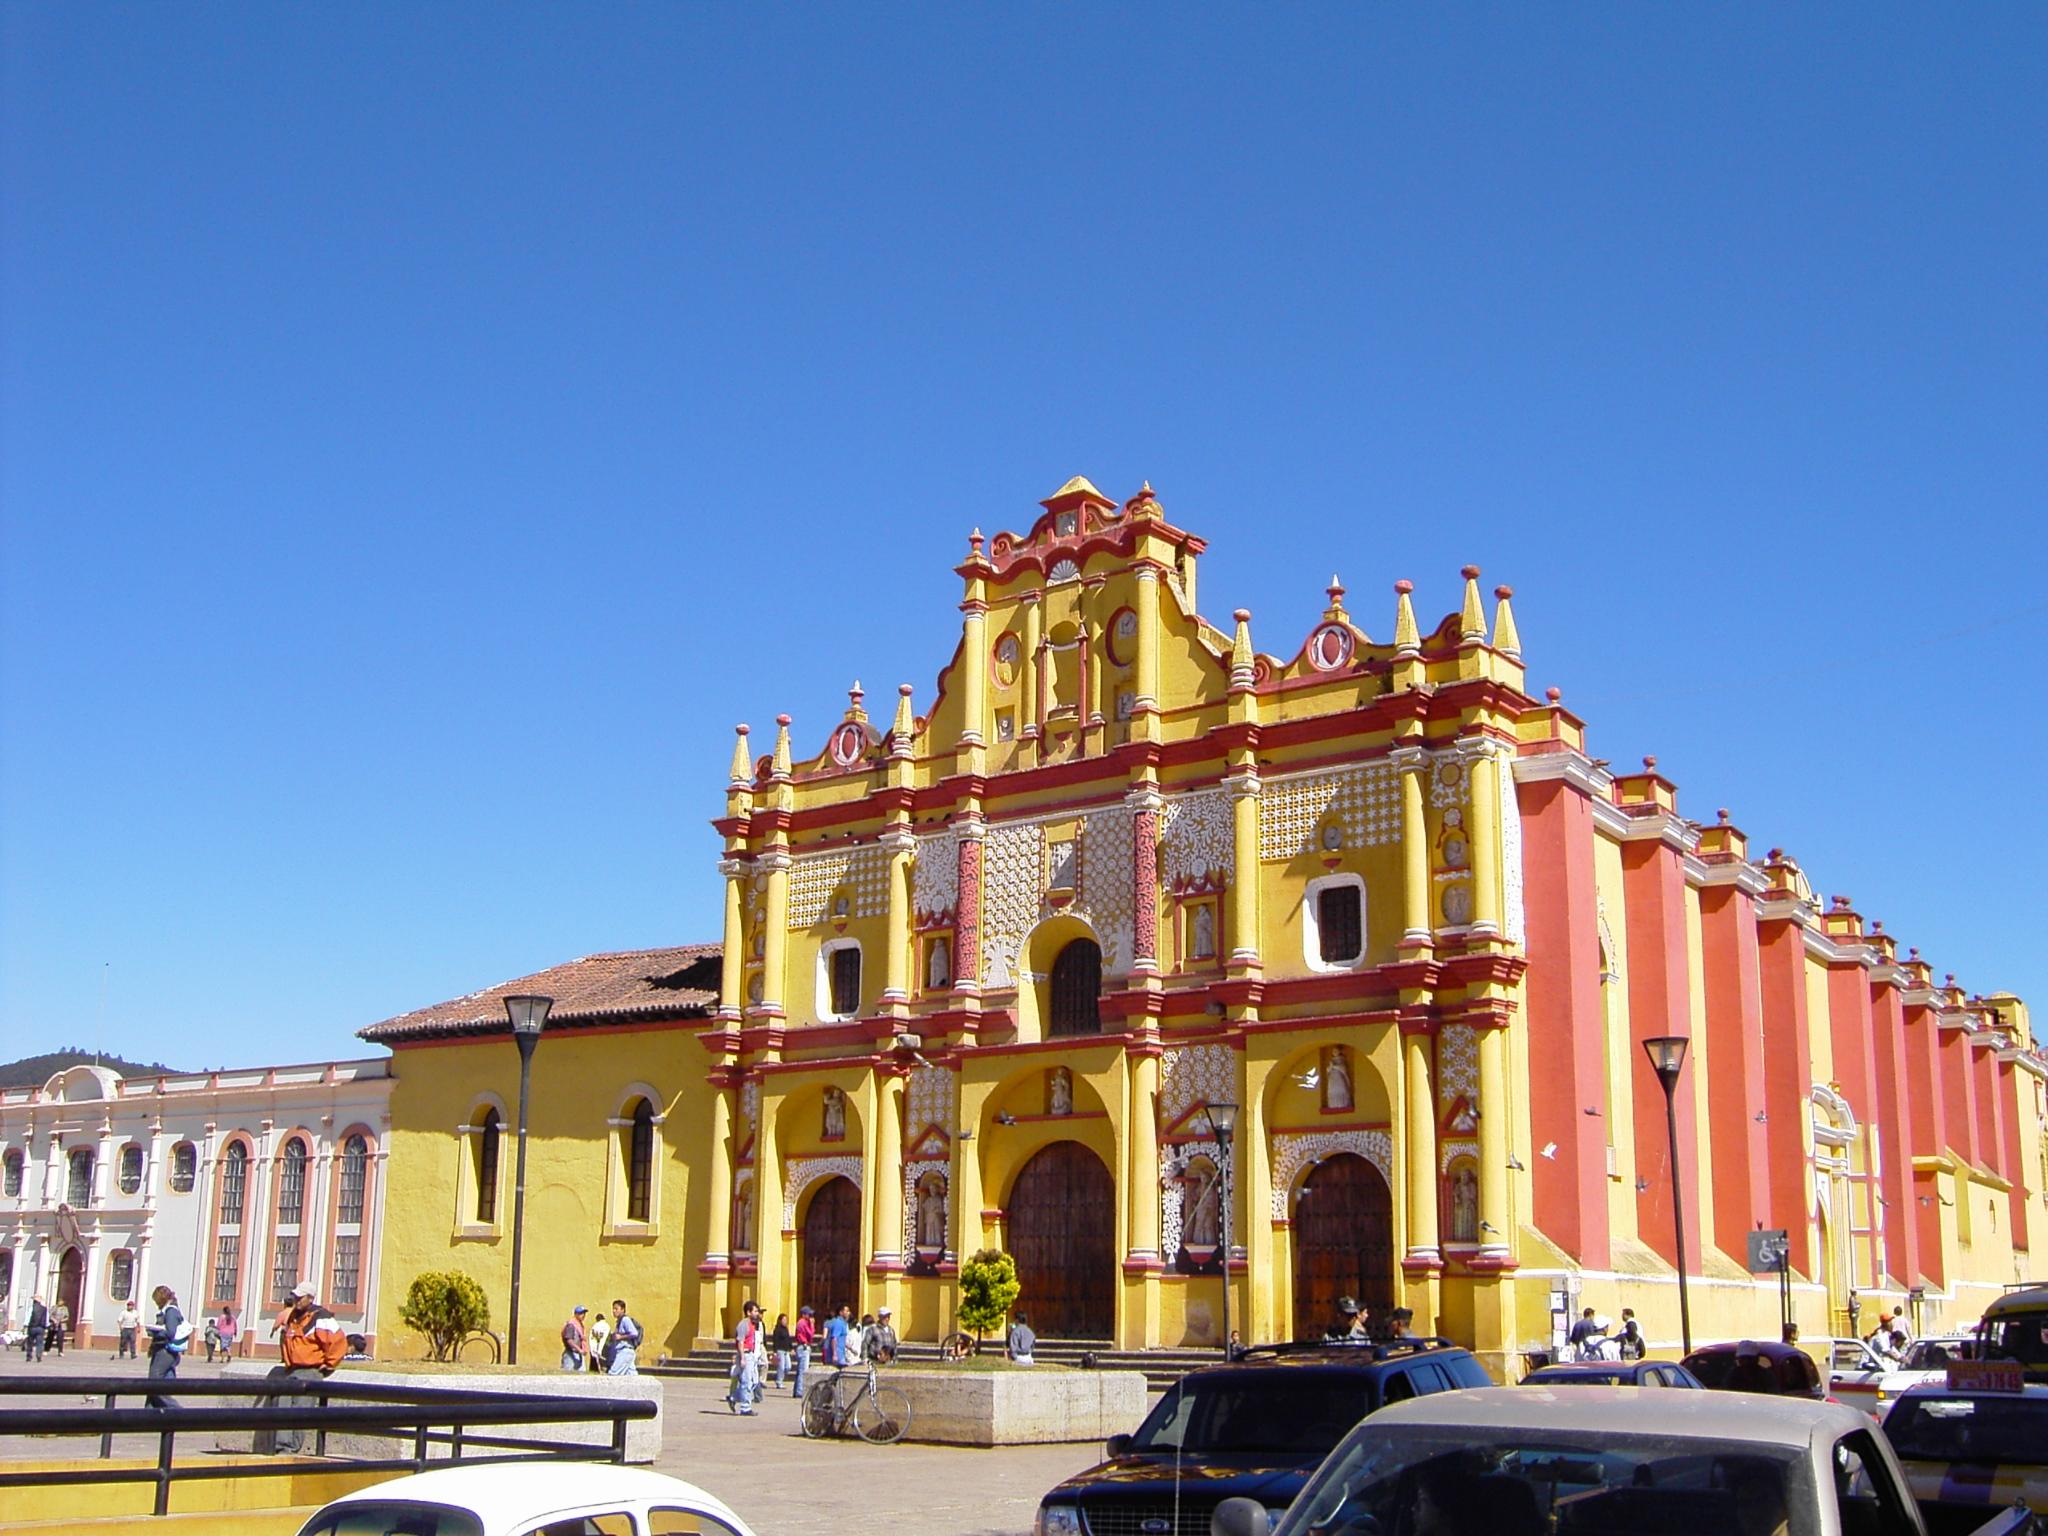 San Cristobal De Las Casa Mexico  City new picture : San Cristóbal de Las Casas 18 Wikimedia Commons